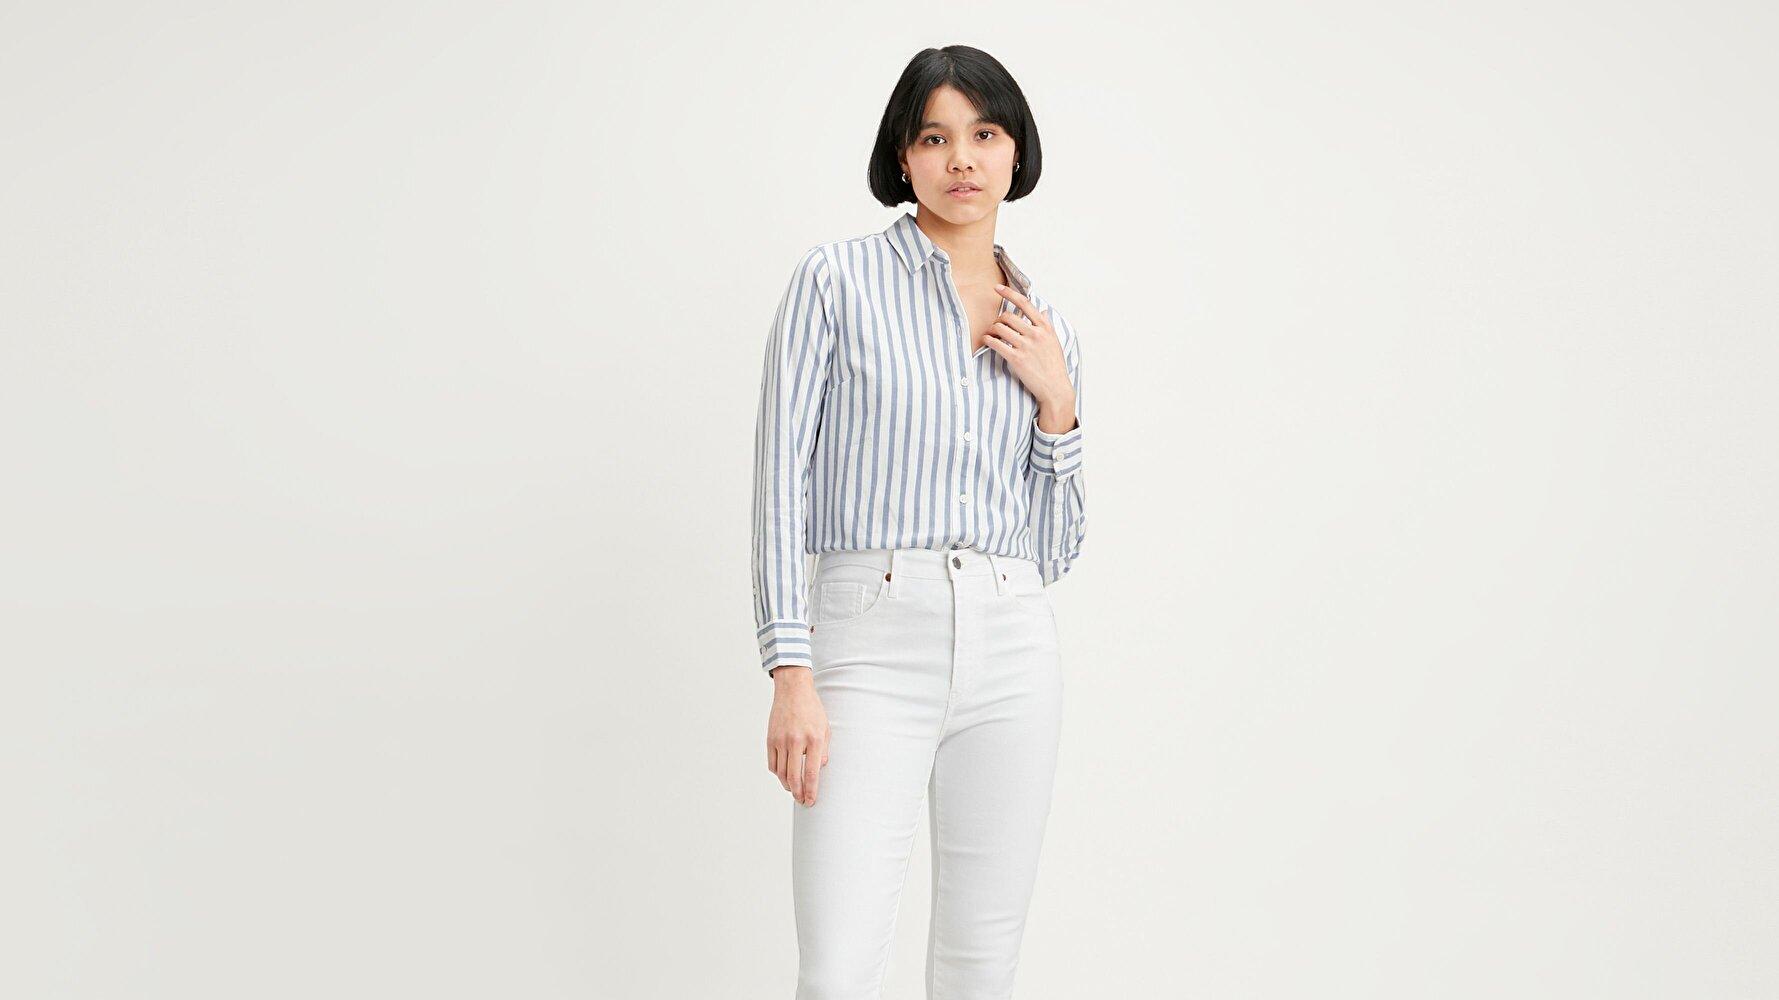 The Classic Bw Shirt Rubellite Colony Çok renkli Kadın Gömlek